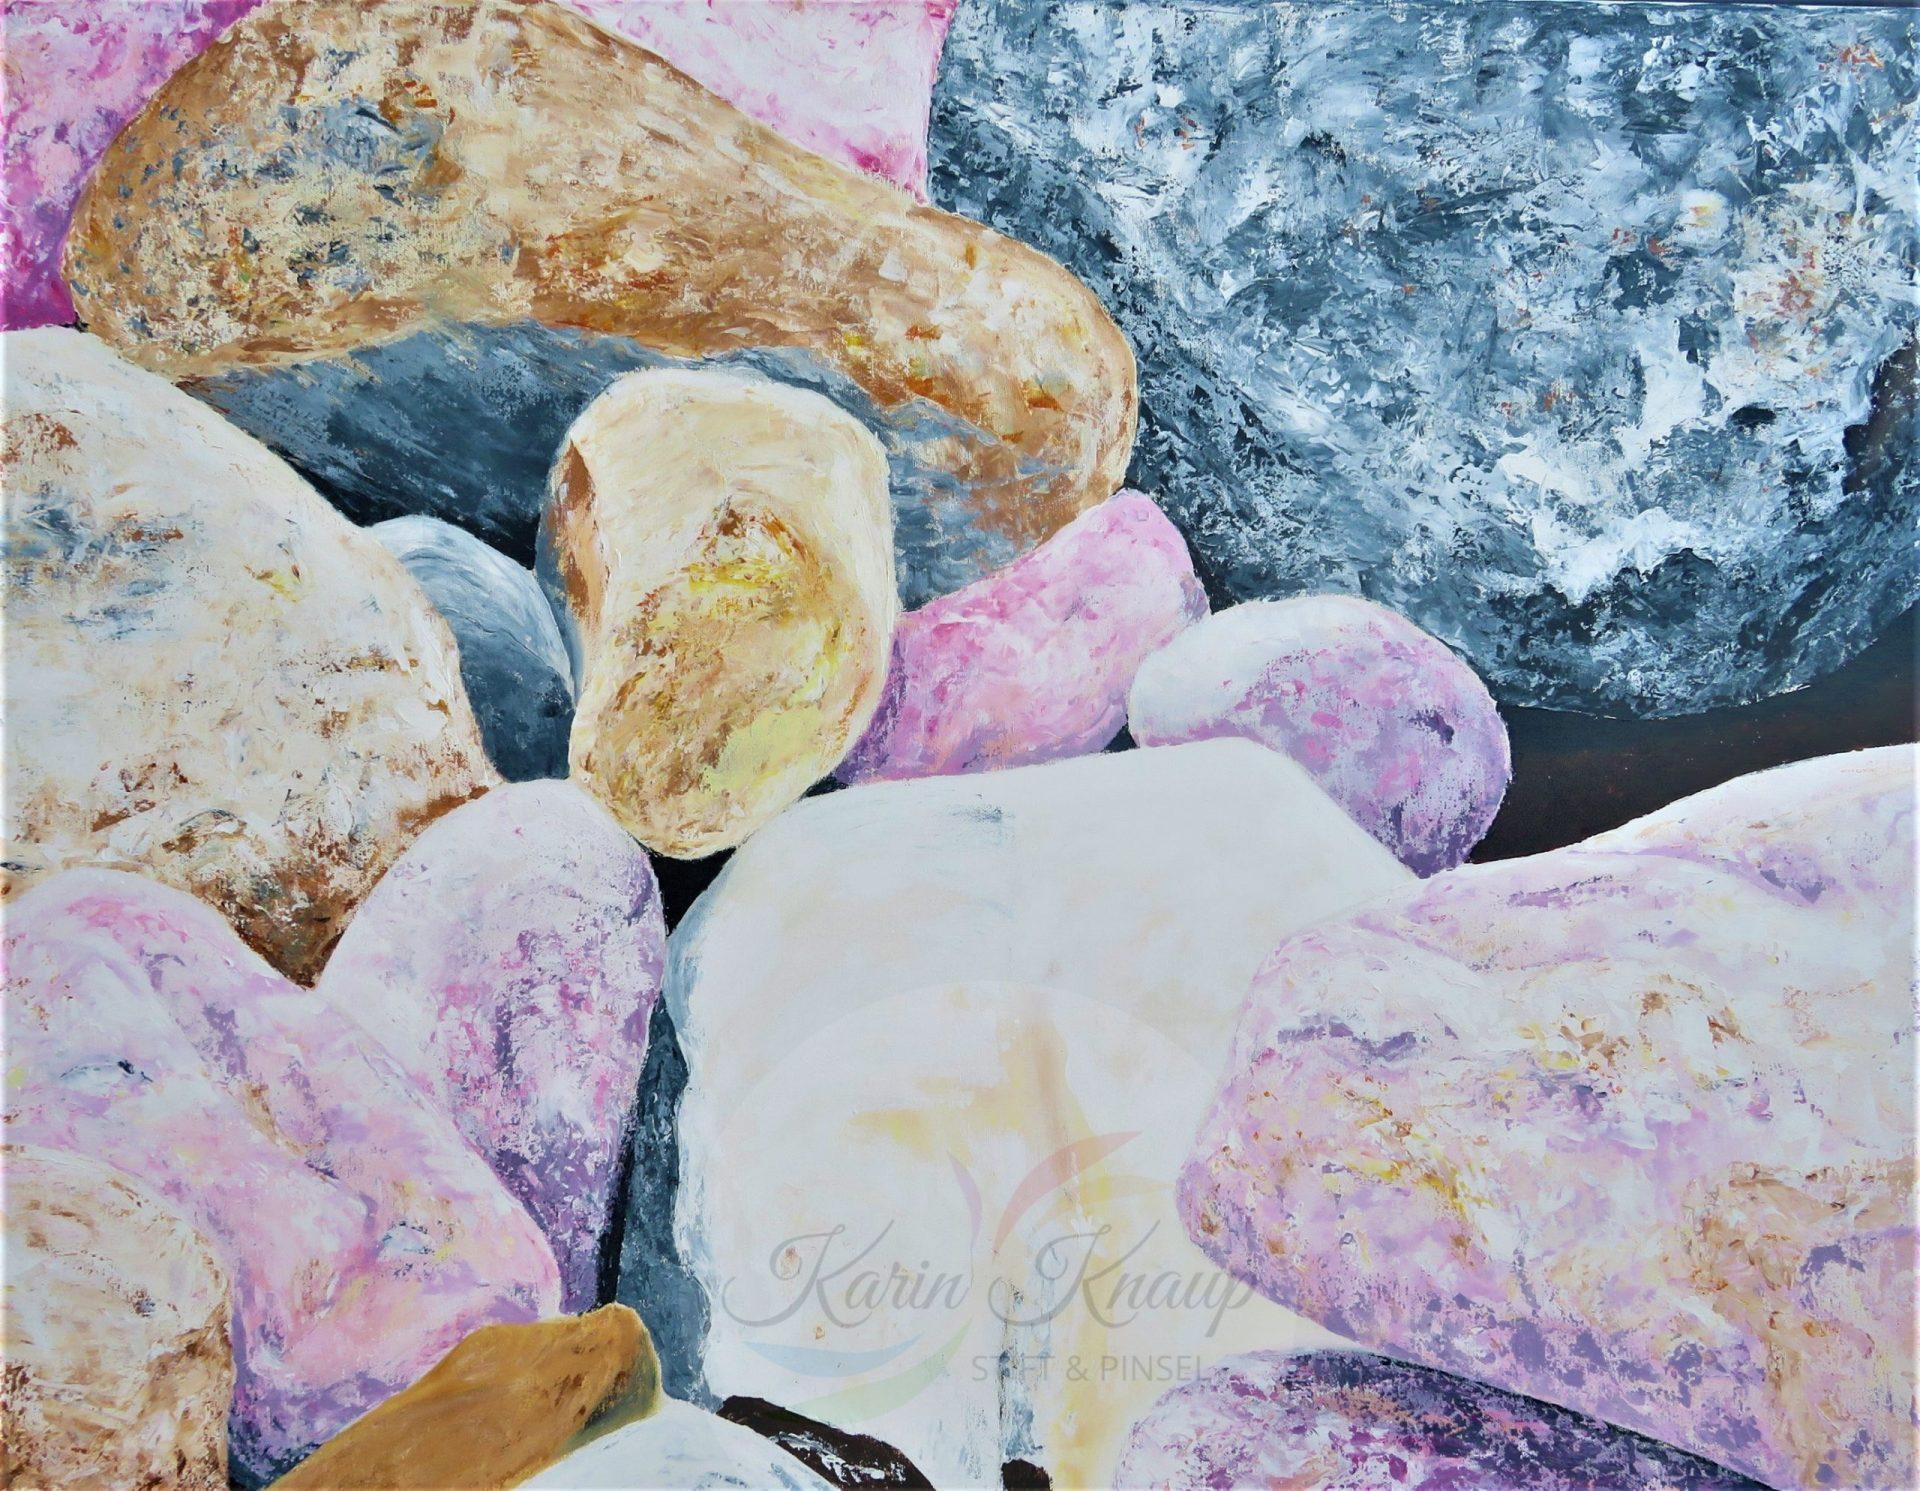 Steine, Acryl auf Leinwand, 70 x 90 cm